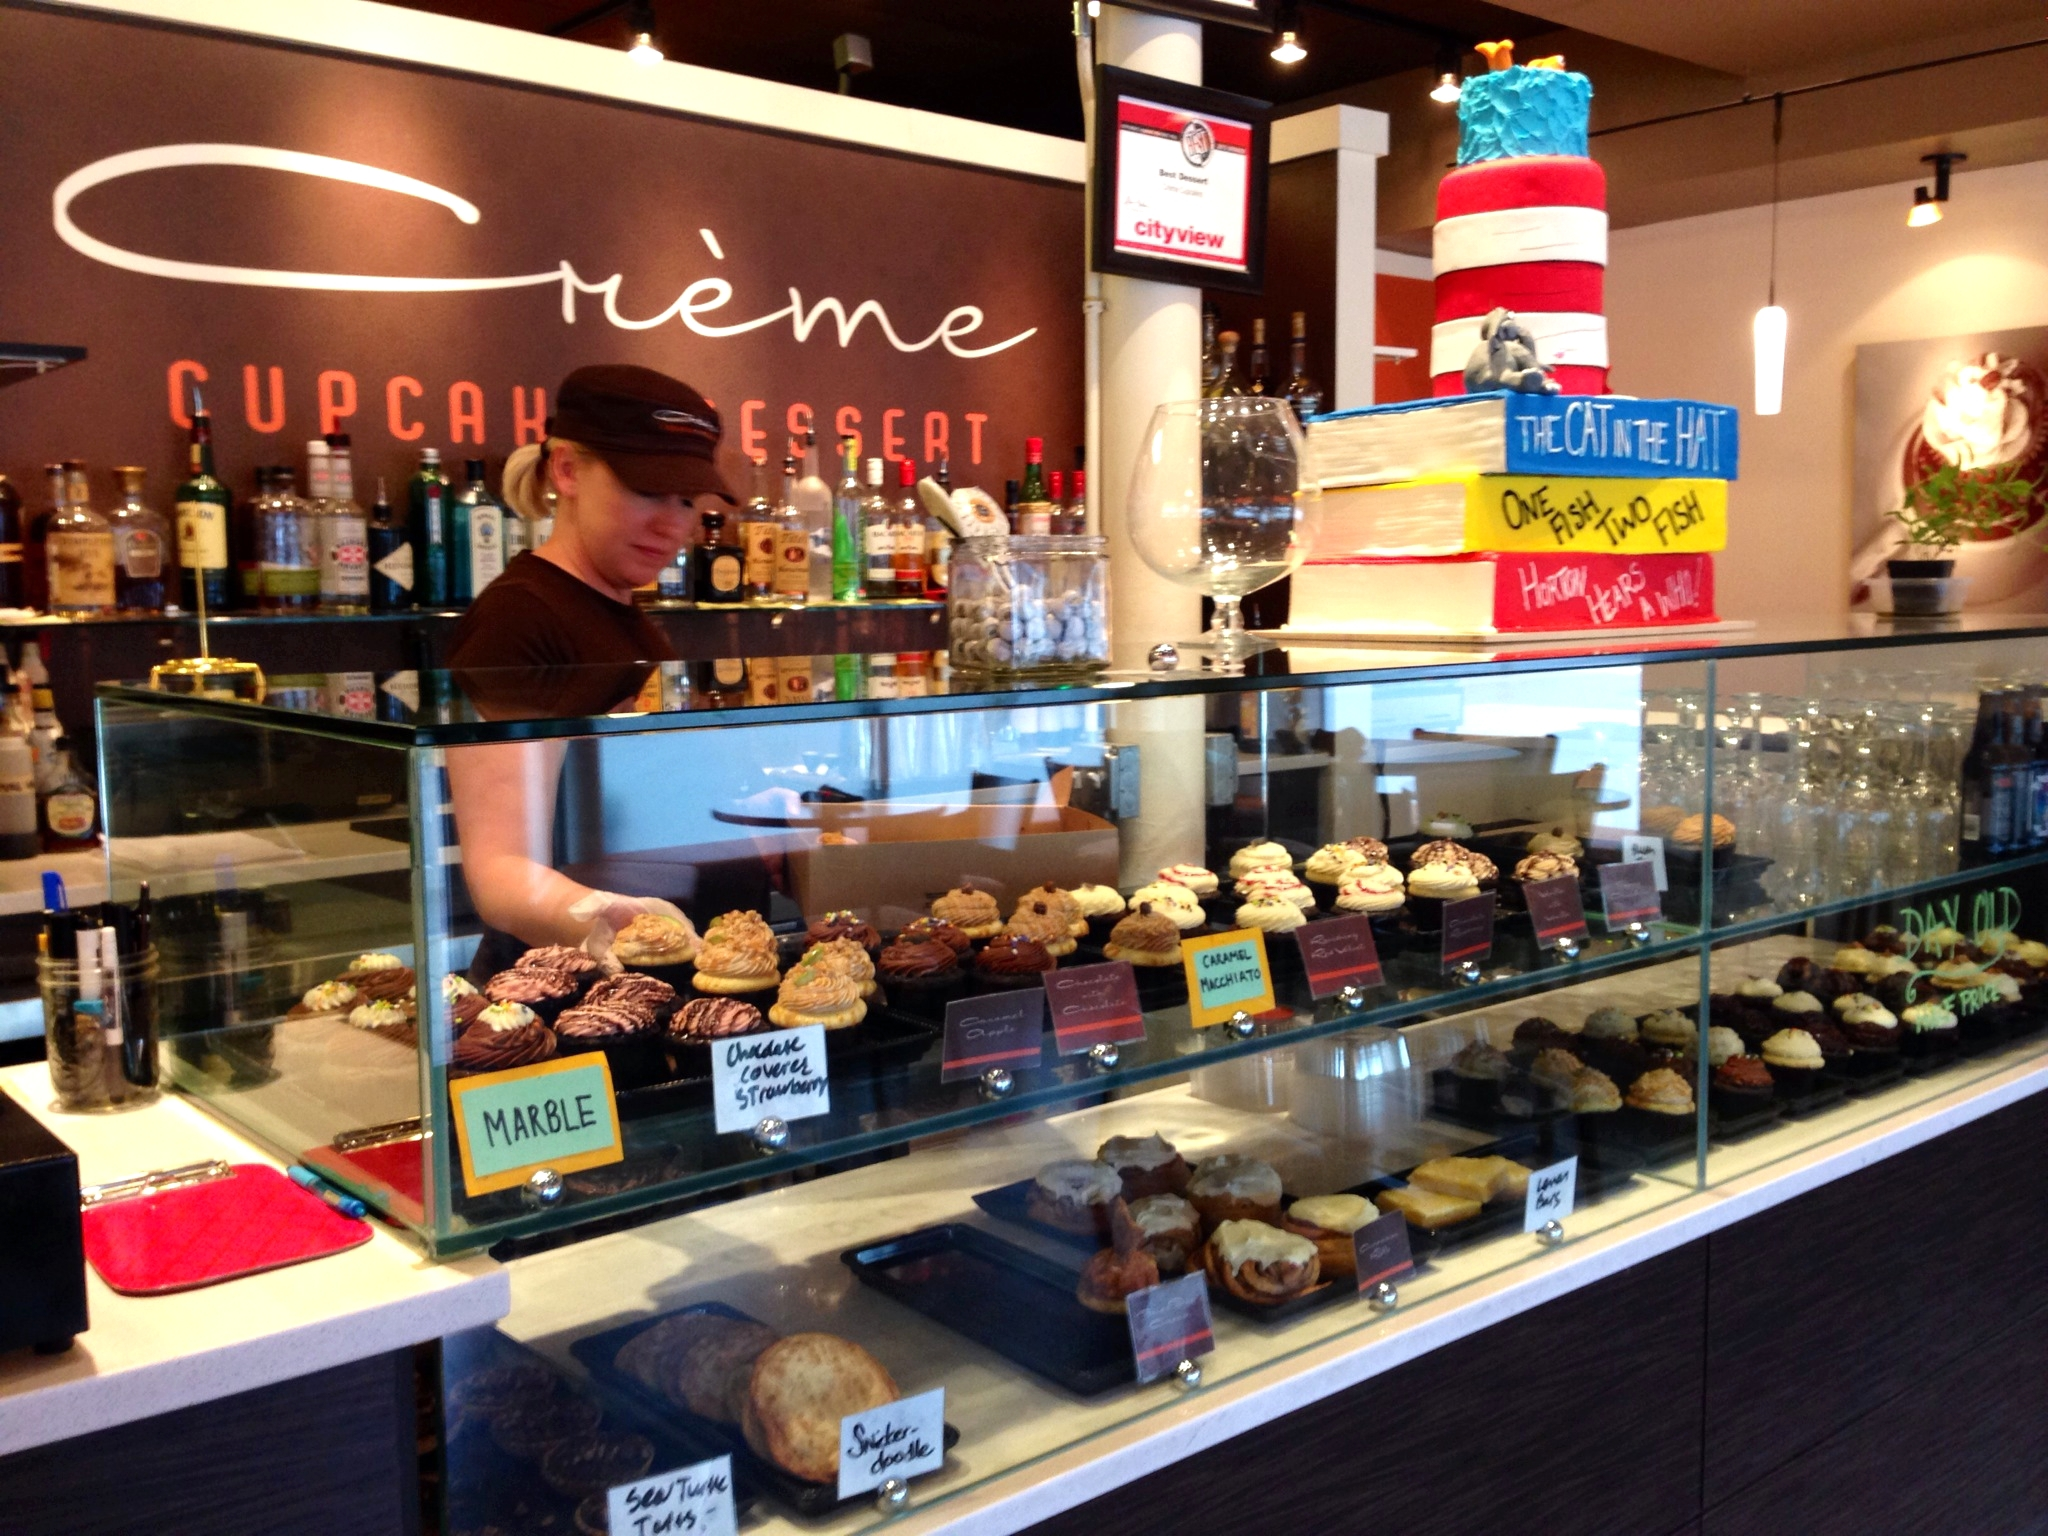 Christina Moffatt, owner of Crème Cupcake + Dessert in Des Moines, Iowa.